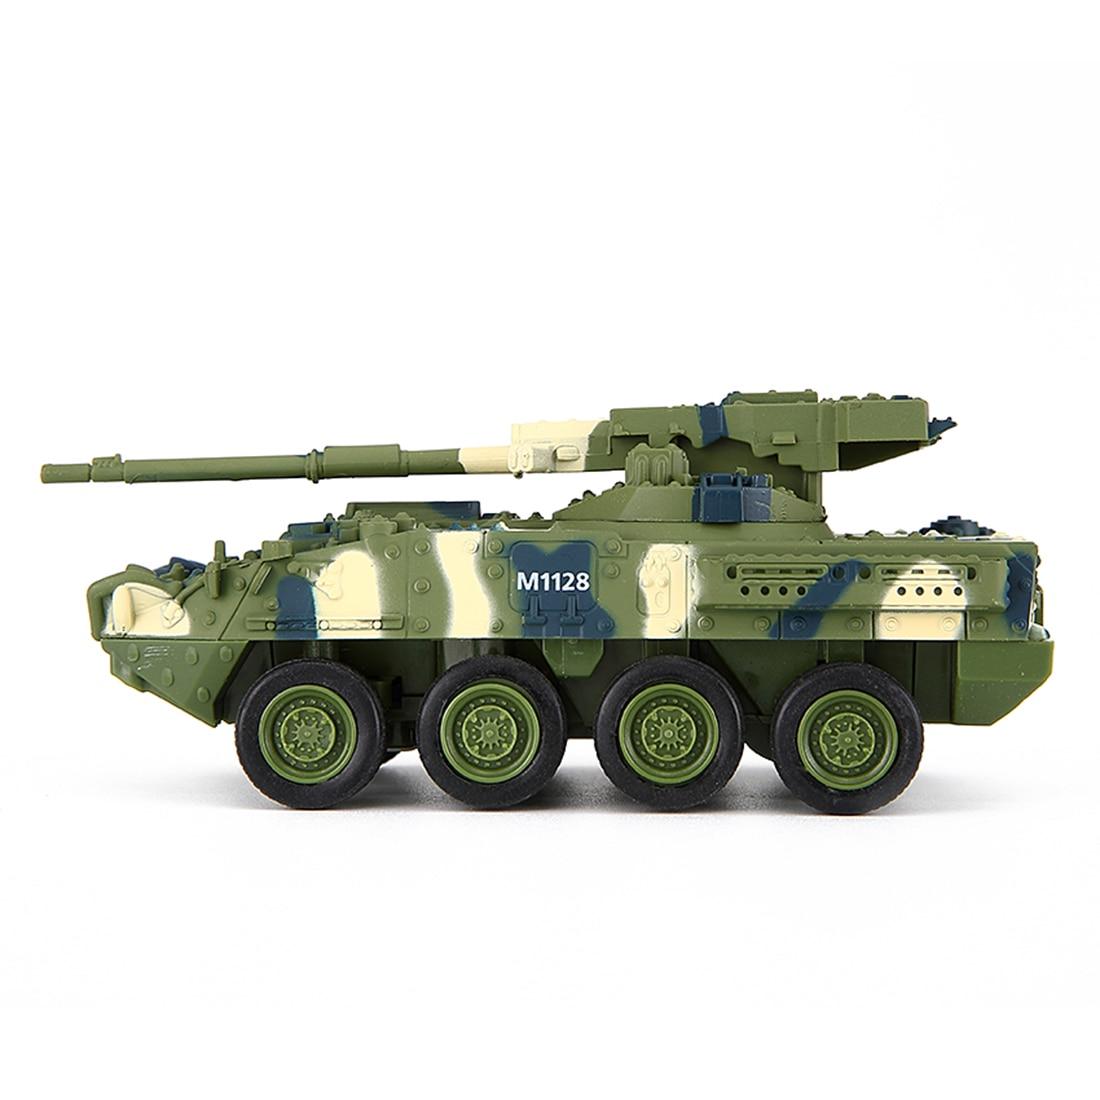 Creative Toy Magic Prestige 8021 Stryker Cannon Car RC Tank Military Model Toys - Green